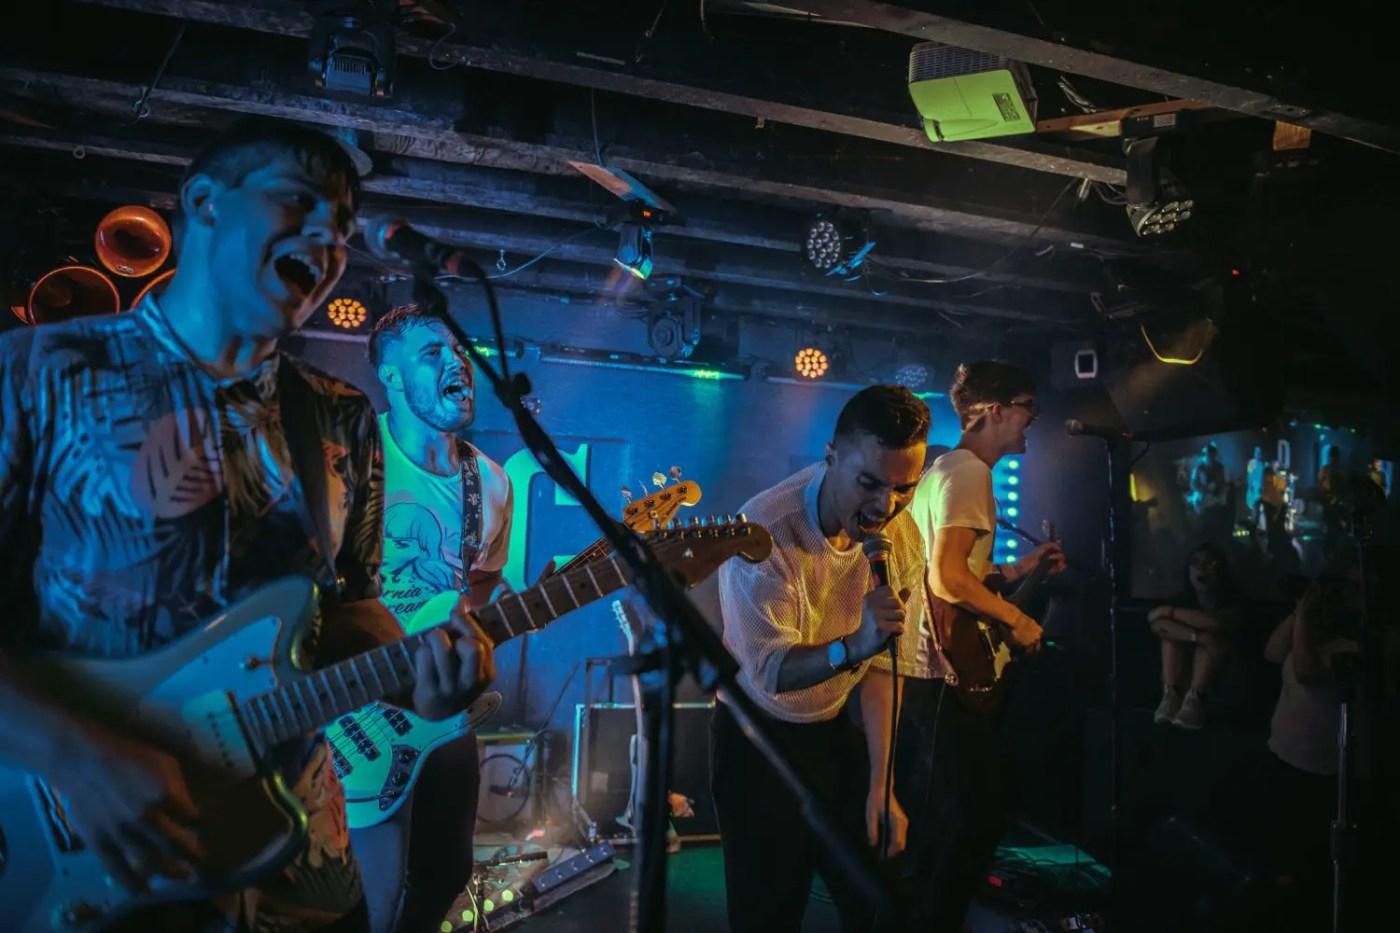 Sub-Radio : DC9 Nightclub   Photos   LIVING LIFE FEARLESS